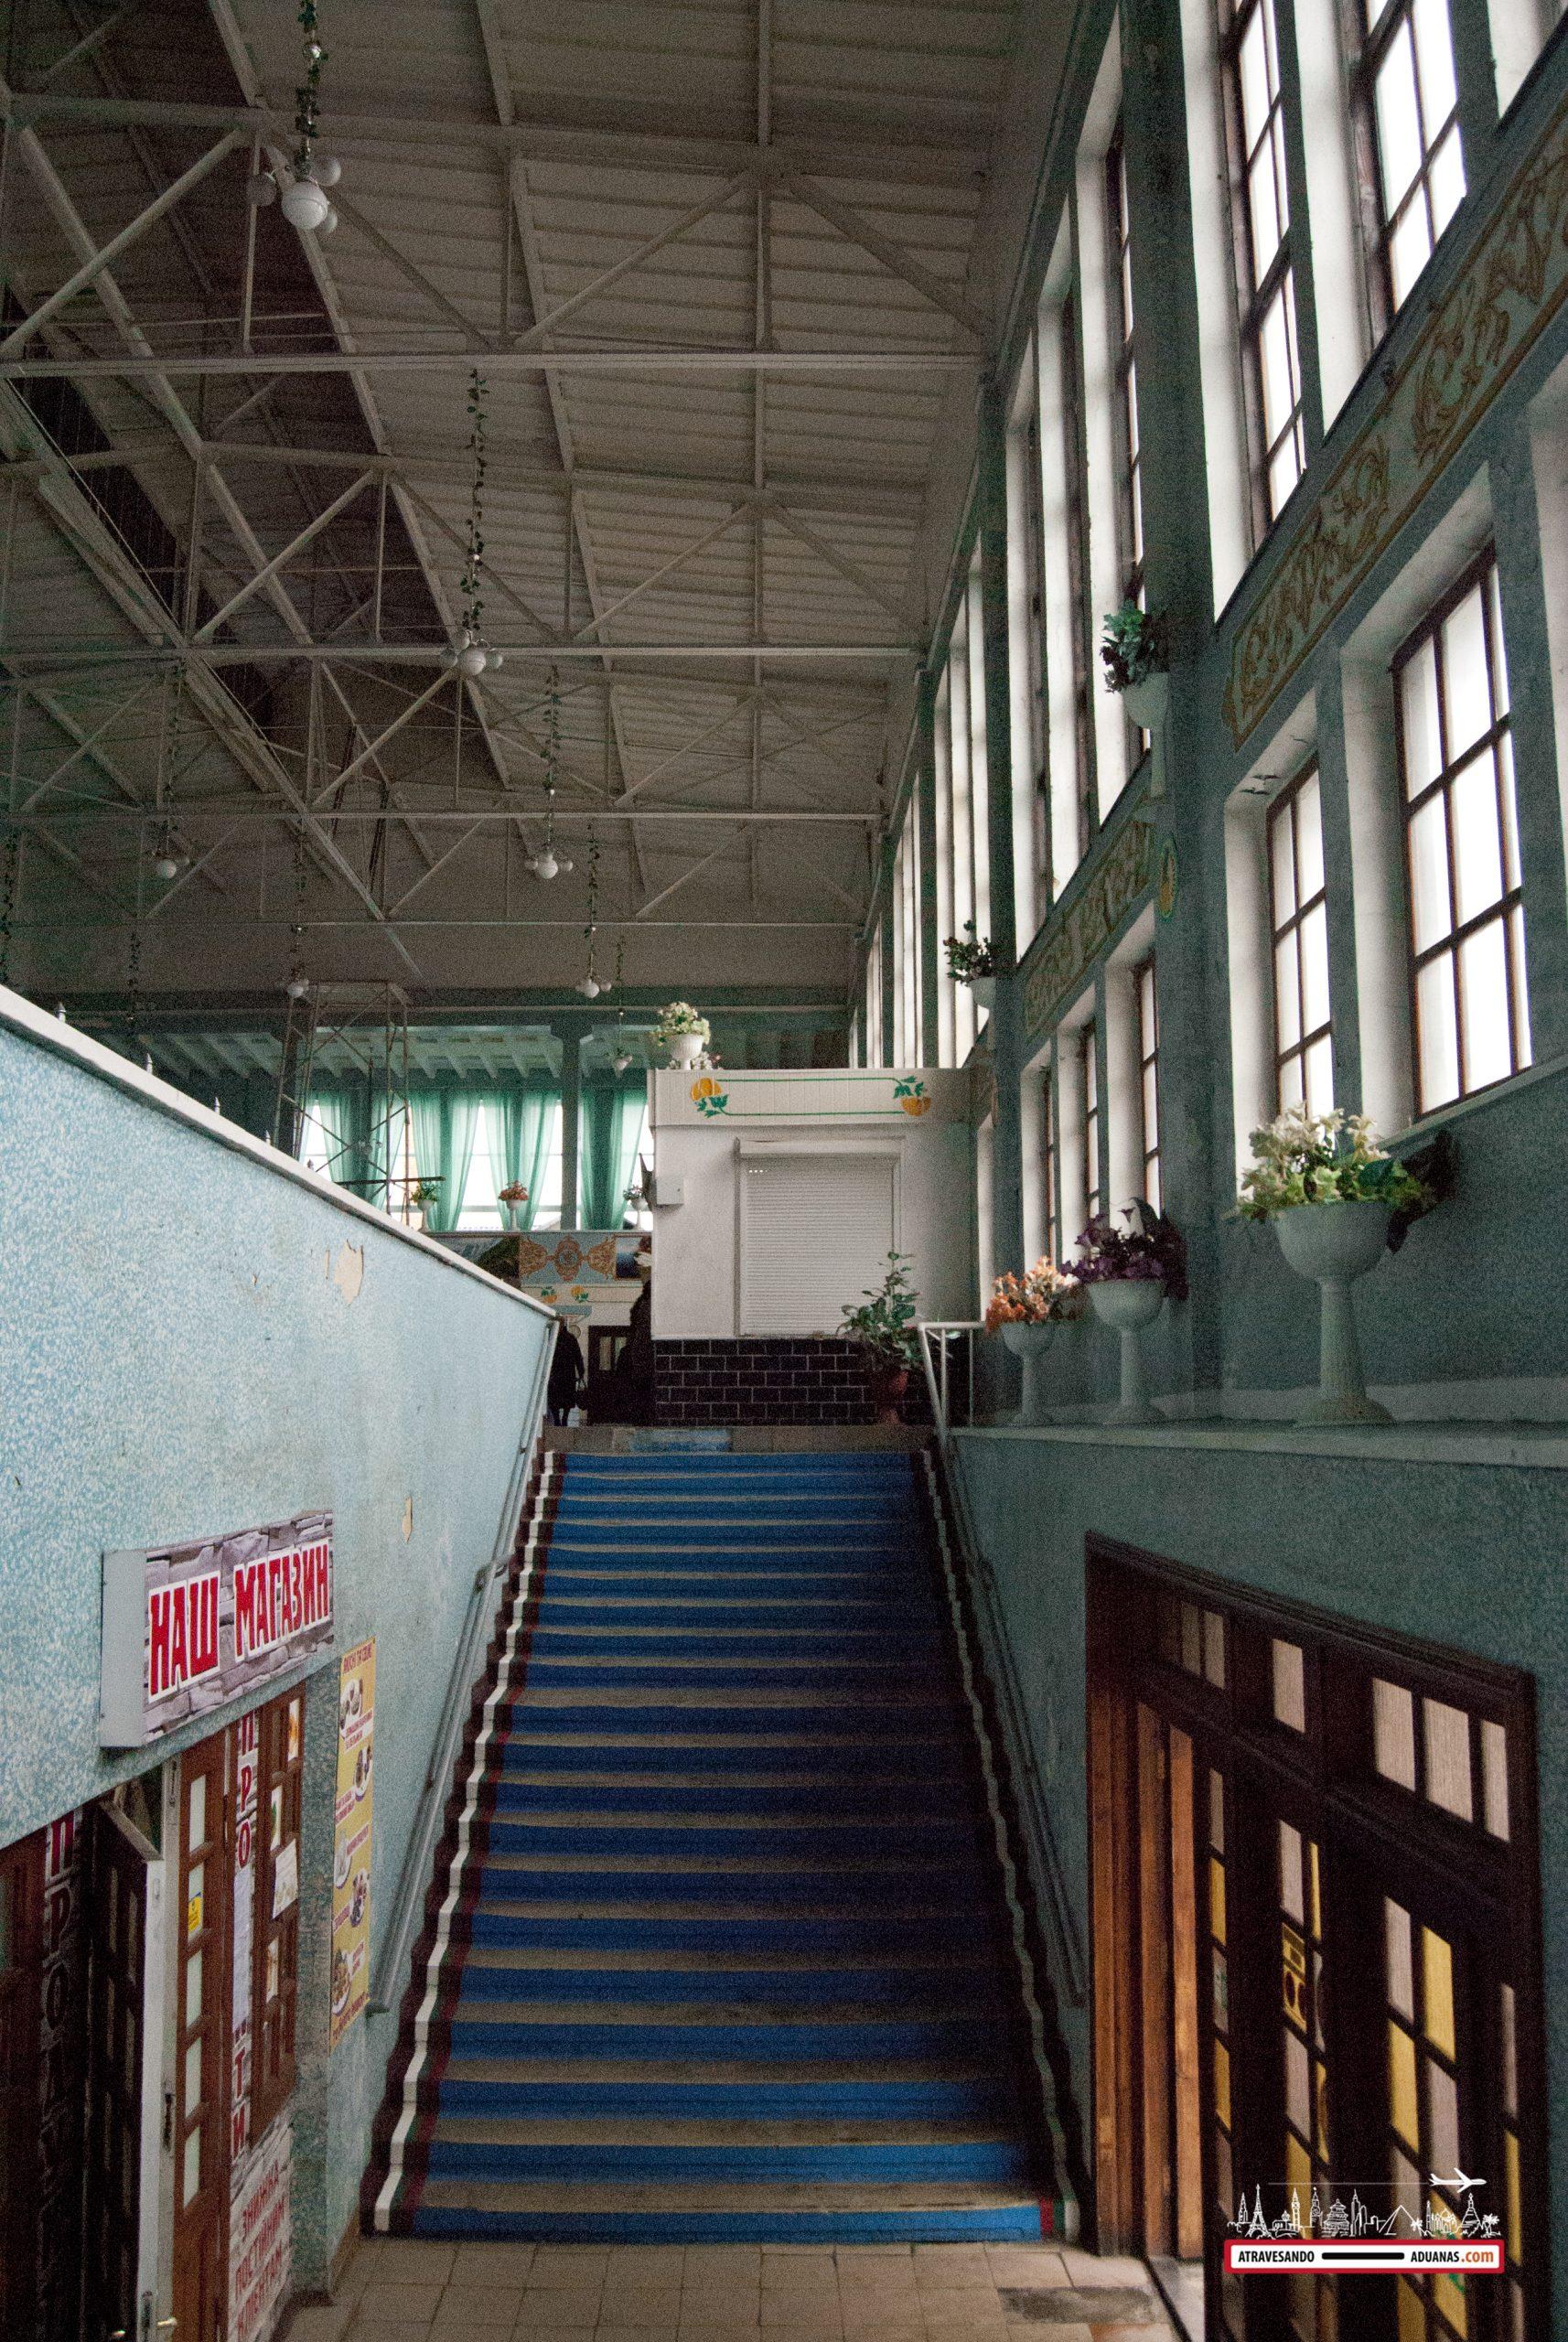 escaleras del mercado de krakivsky, lviv